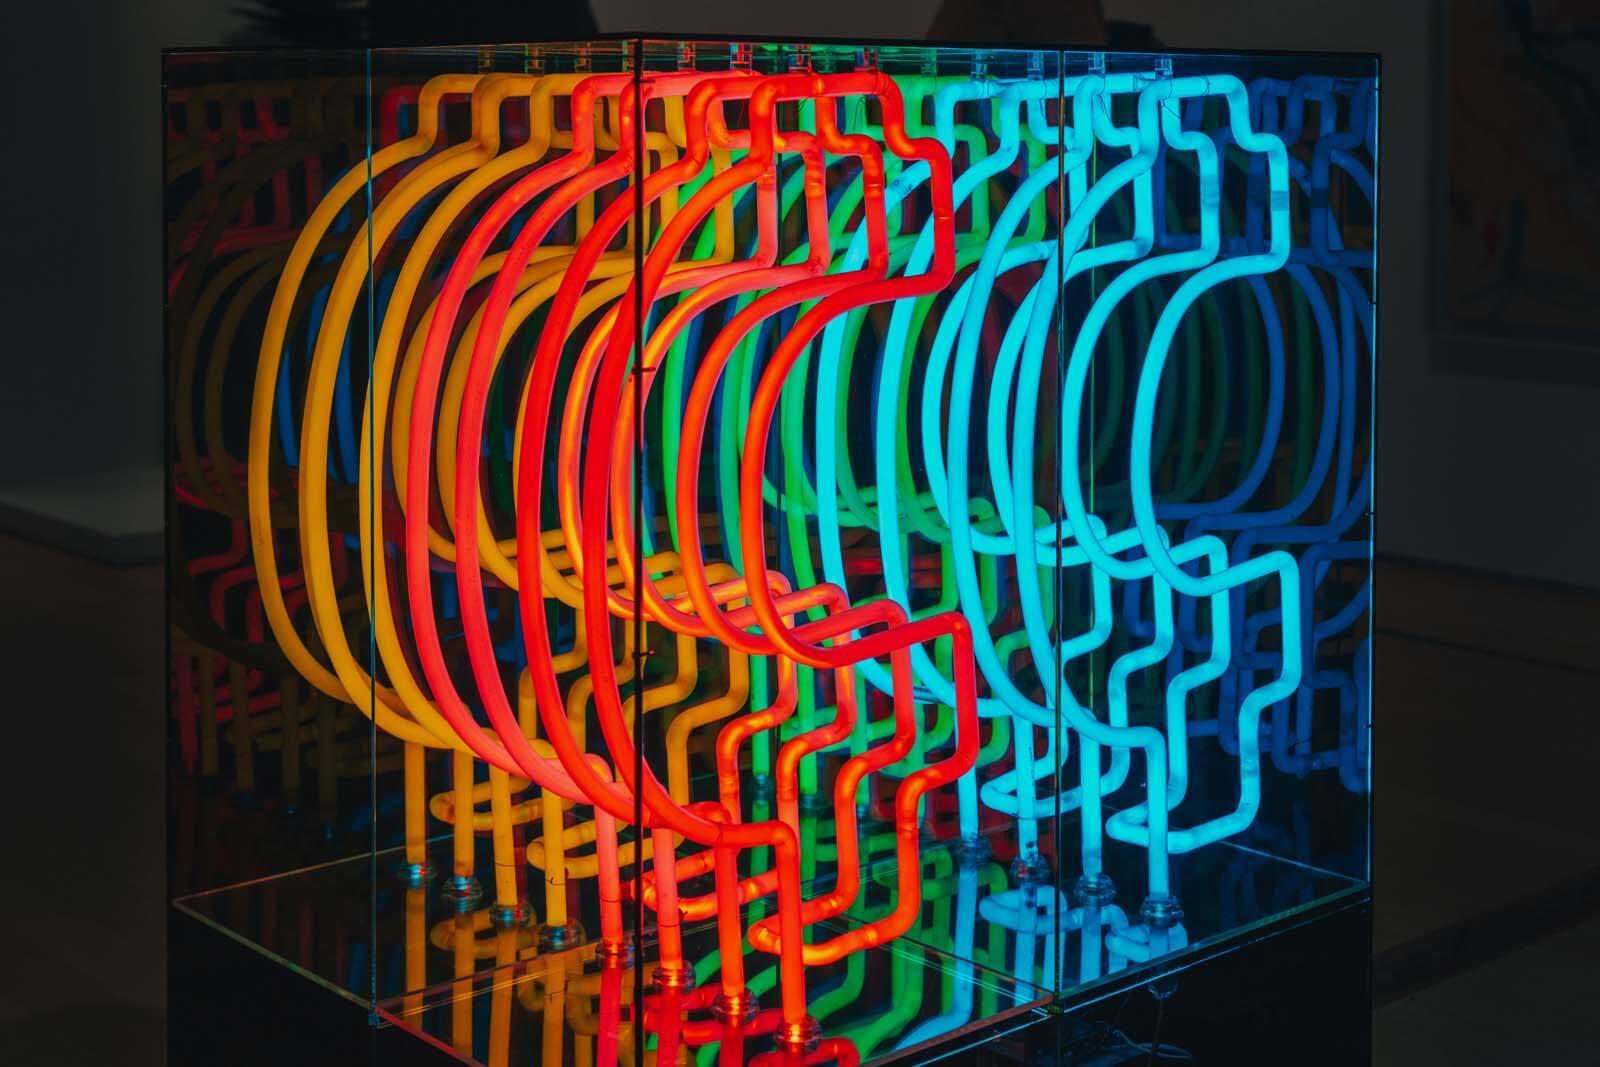 neon exhibit inside the Brooklyn Museum